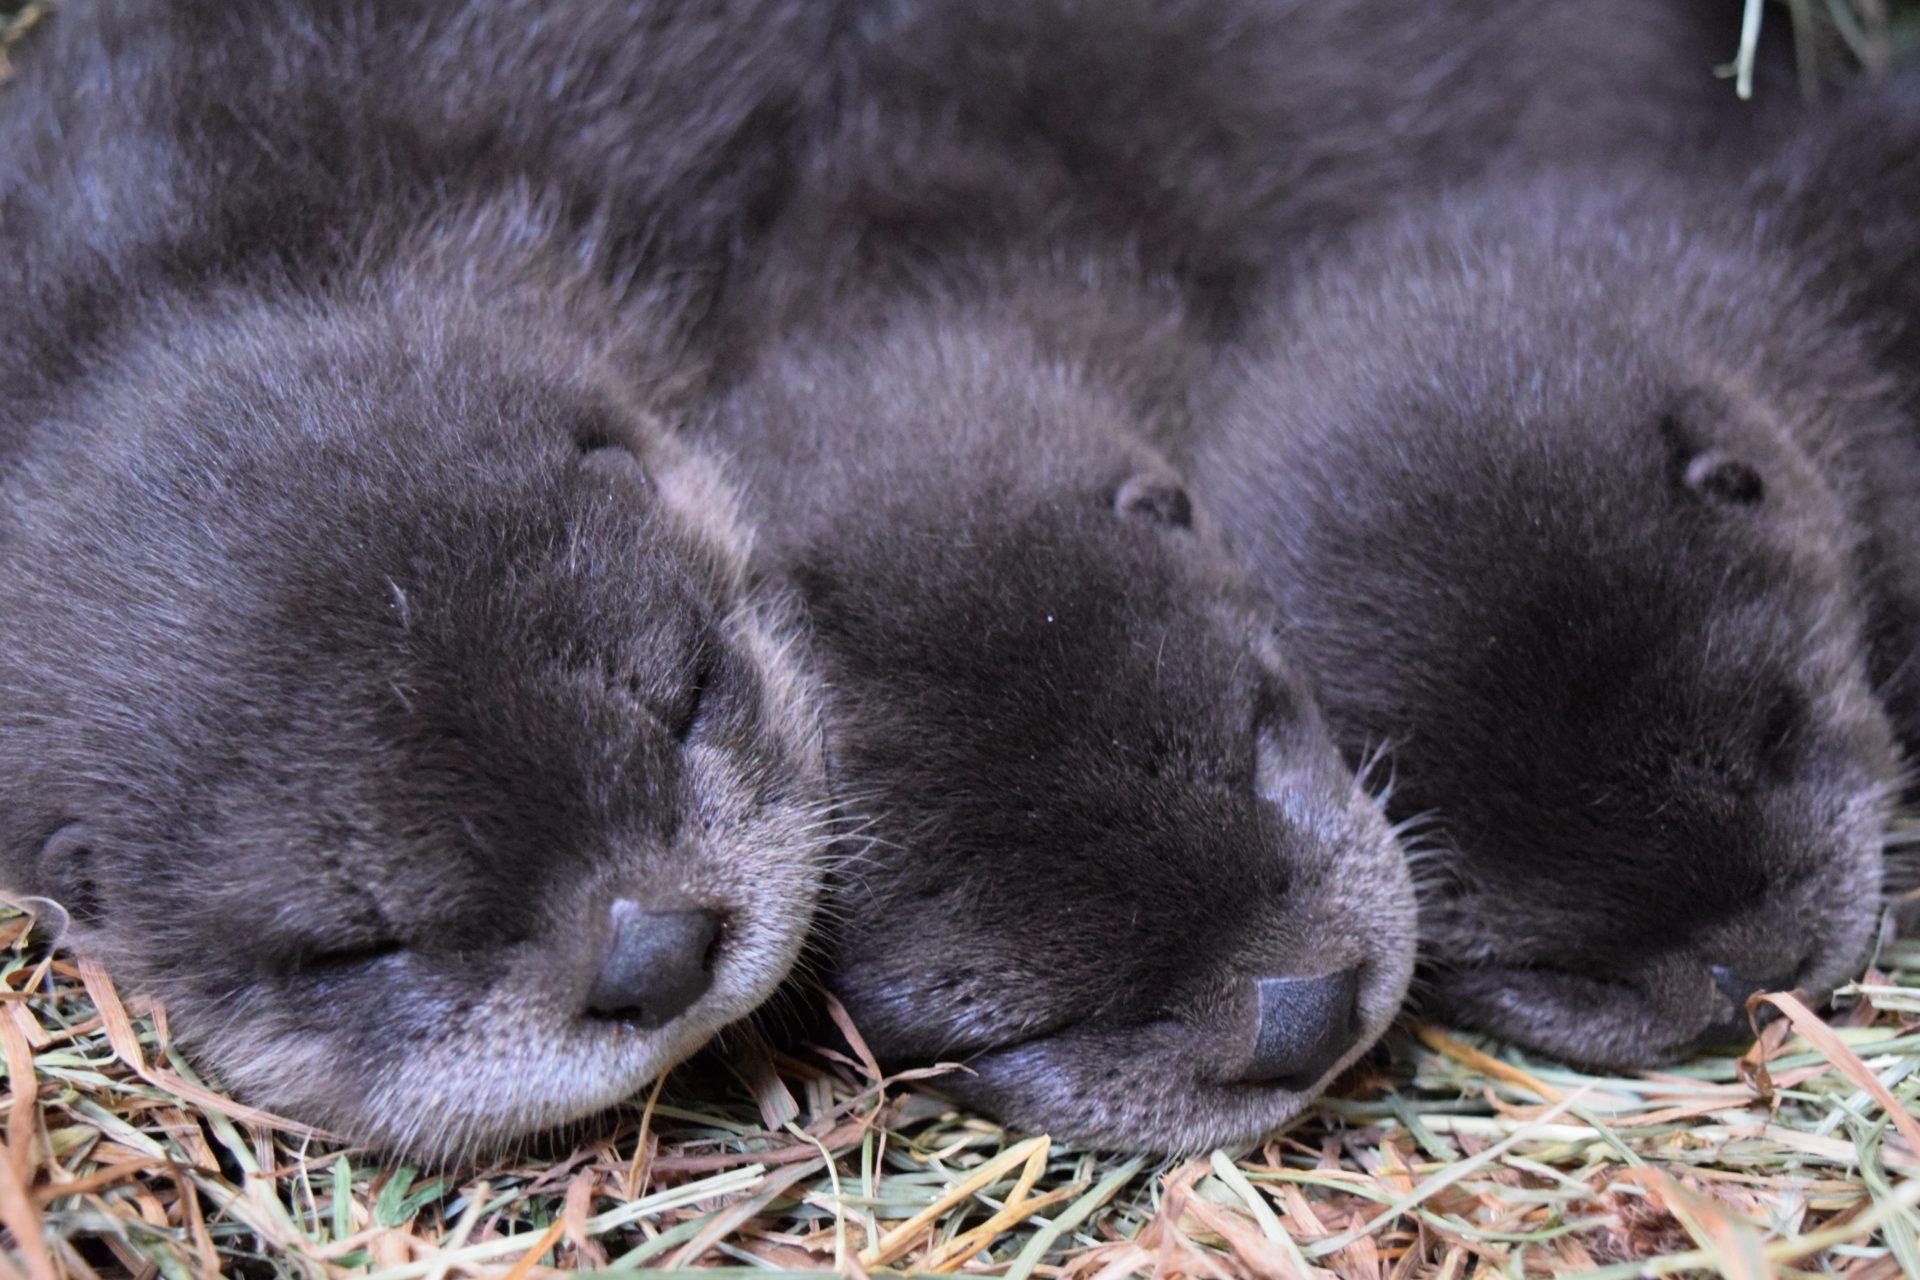 Meet Buttonwood Park Zoo's 3 new furry, adorable otter babies